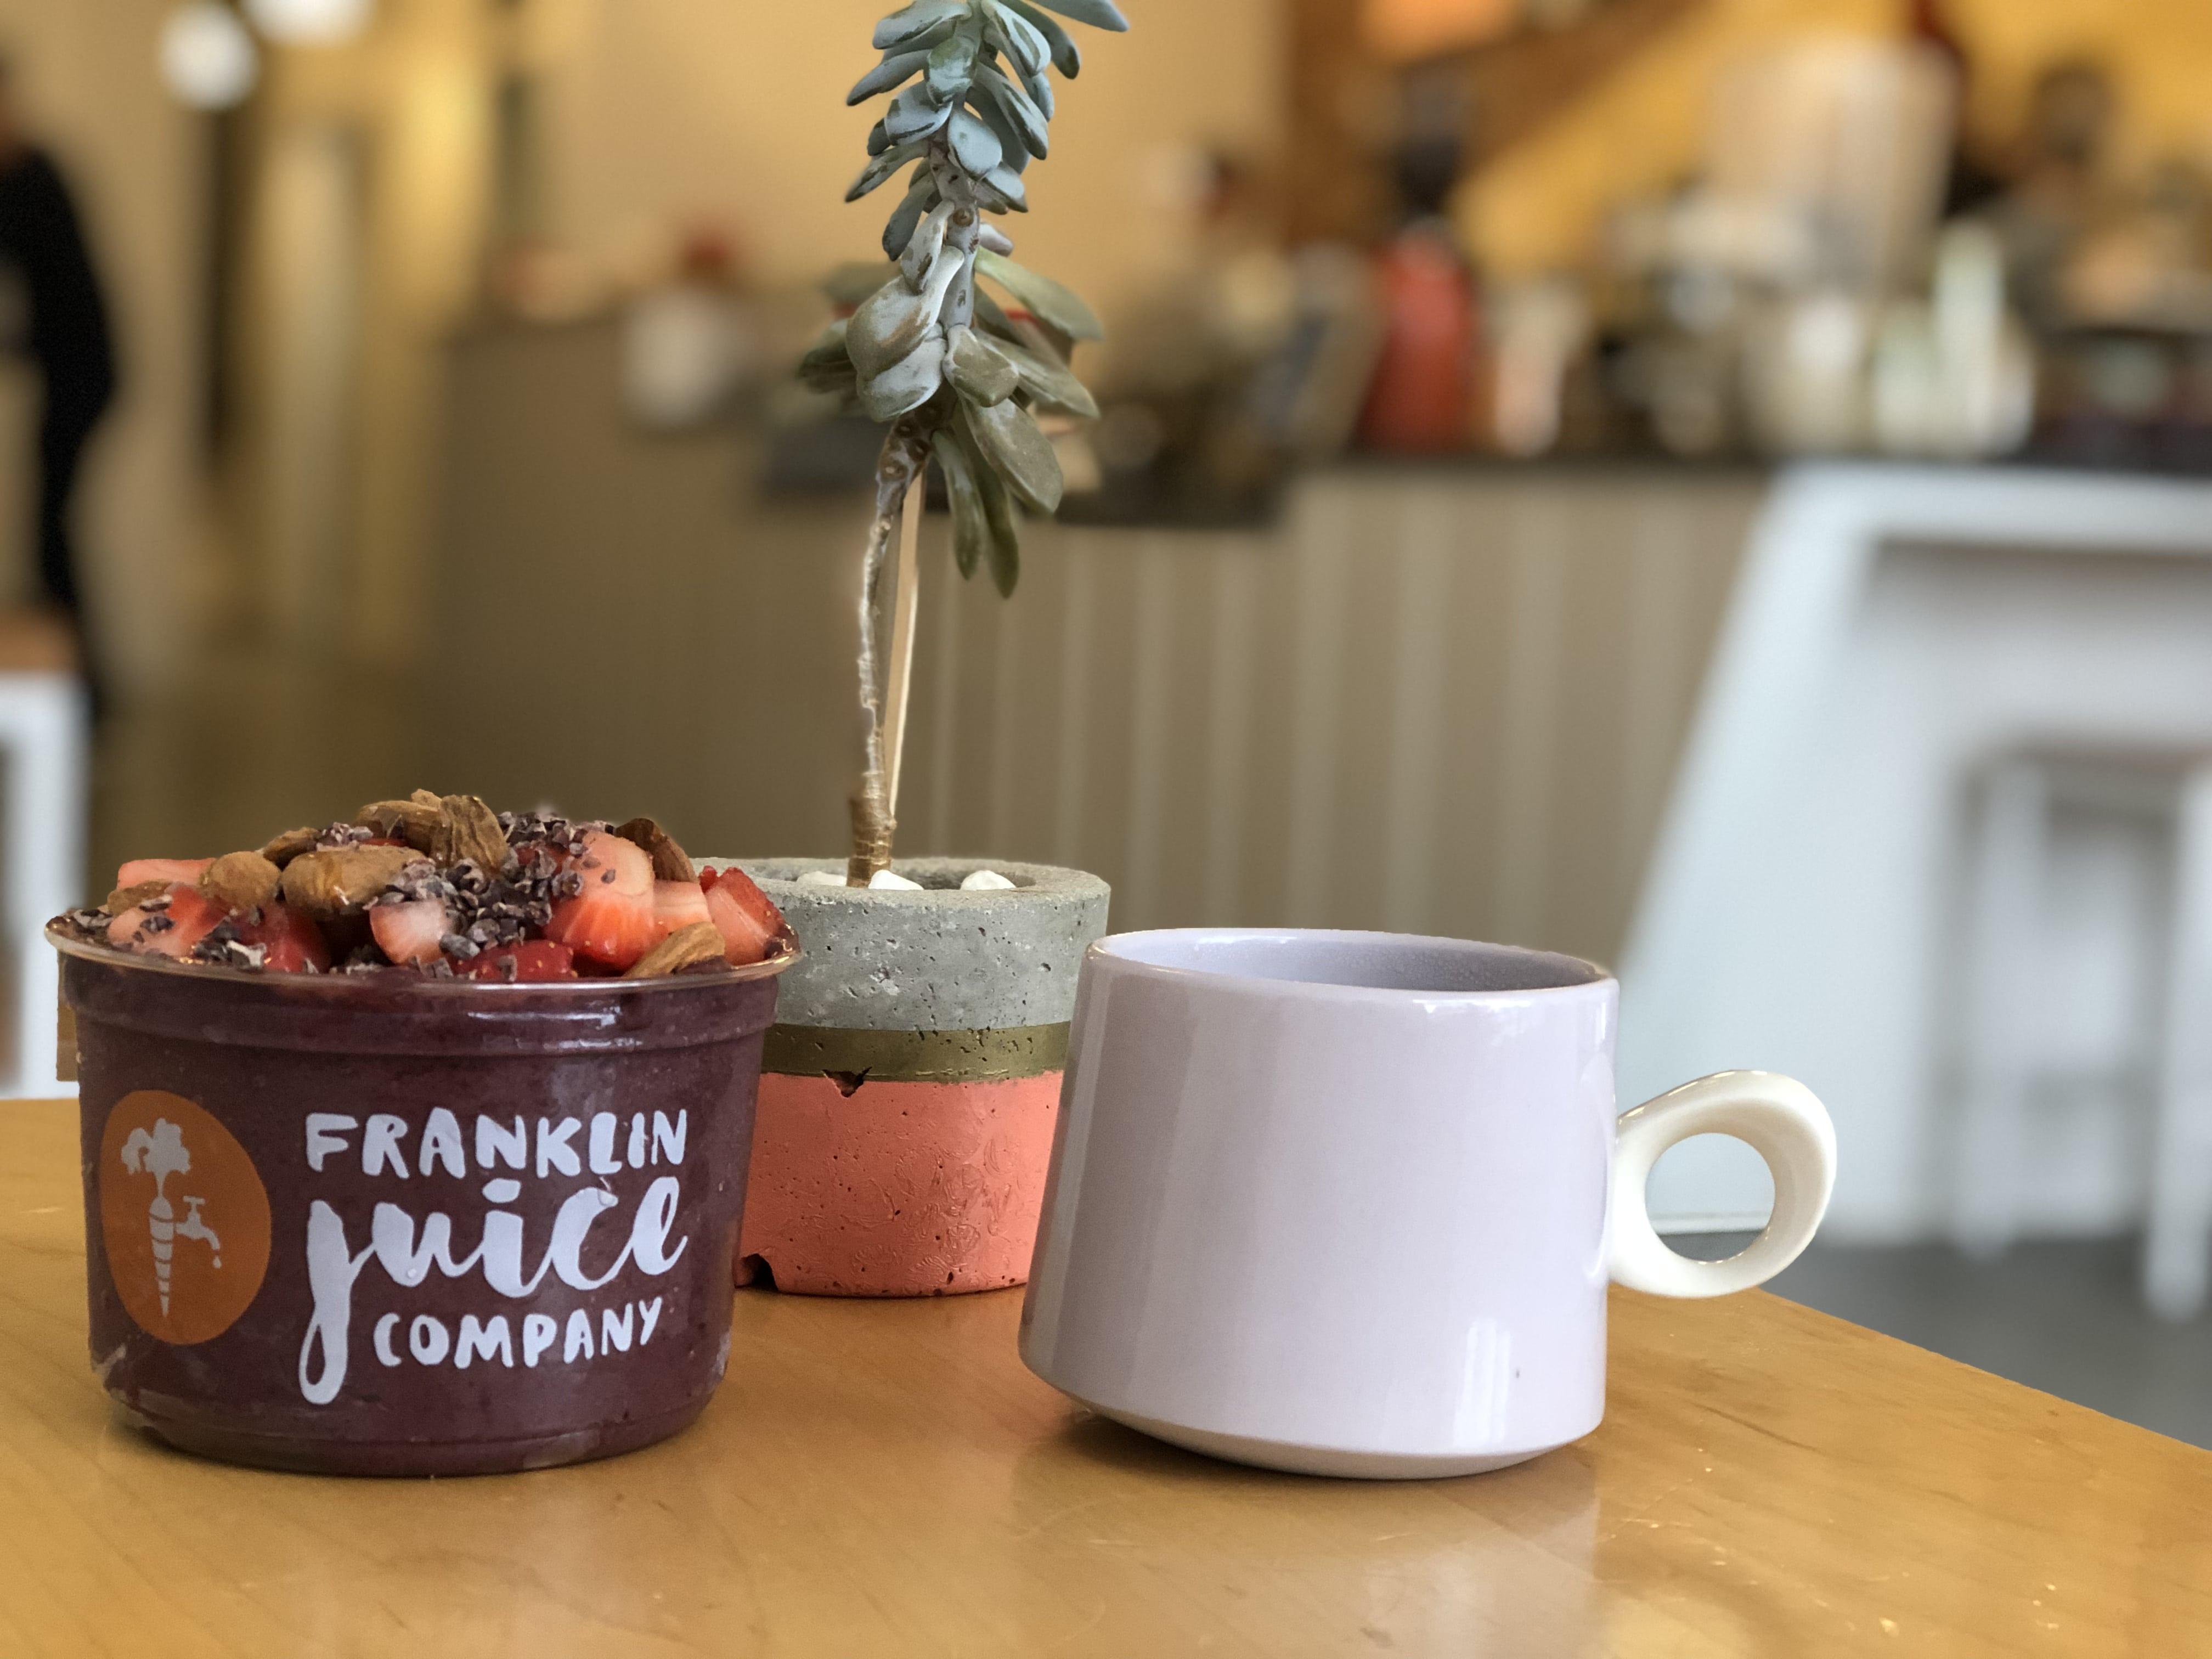 Courtesy of Franklin Juice Company